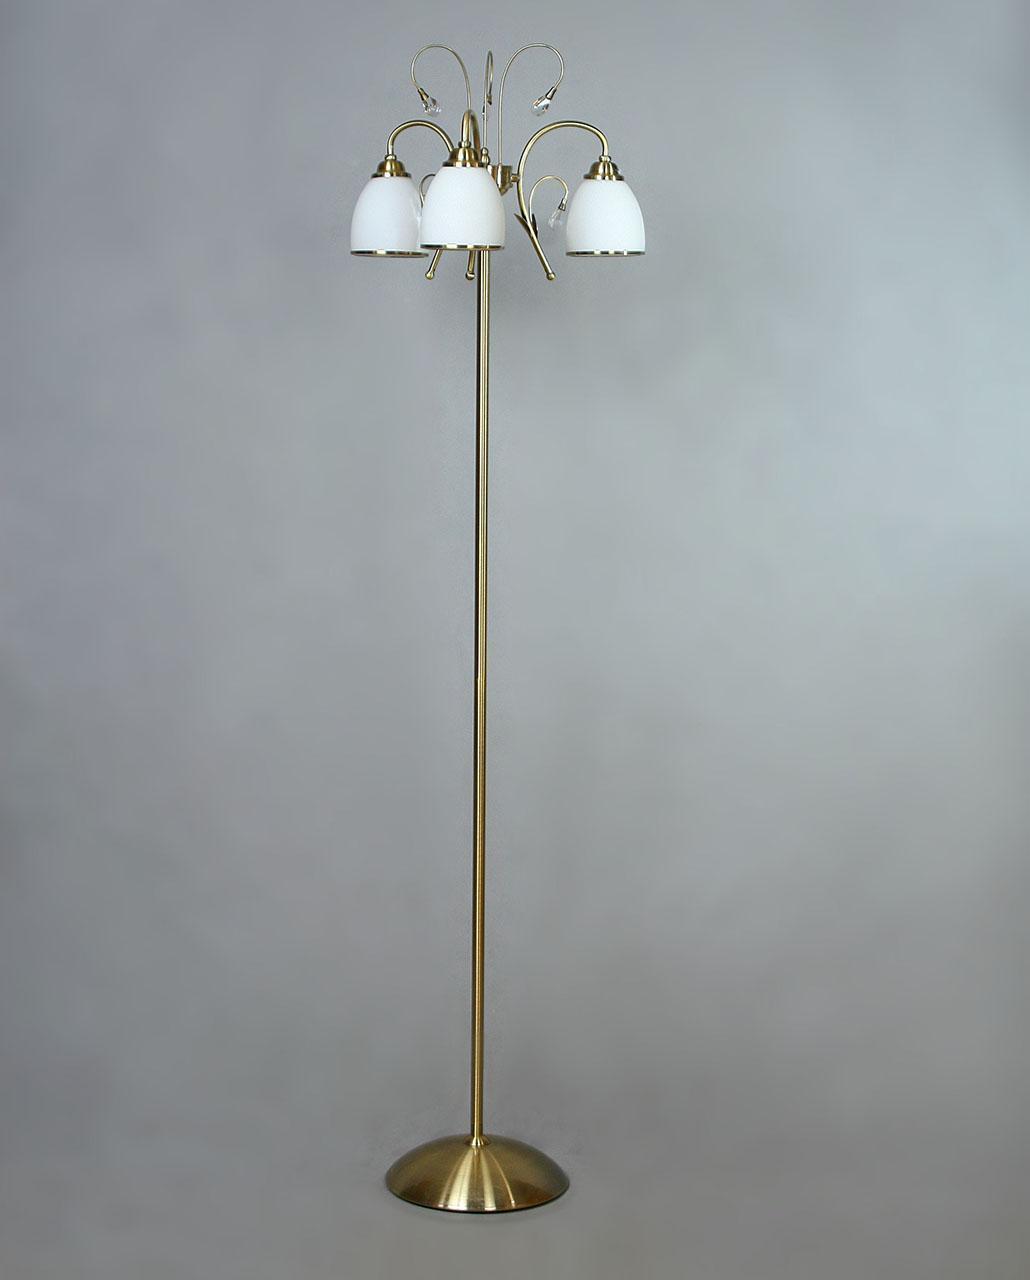 Торшер Brizzi Tarragona MA 02640F/003 Bronze торшер brizzi ma 02401f 003 chrome